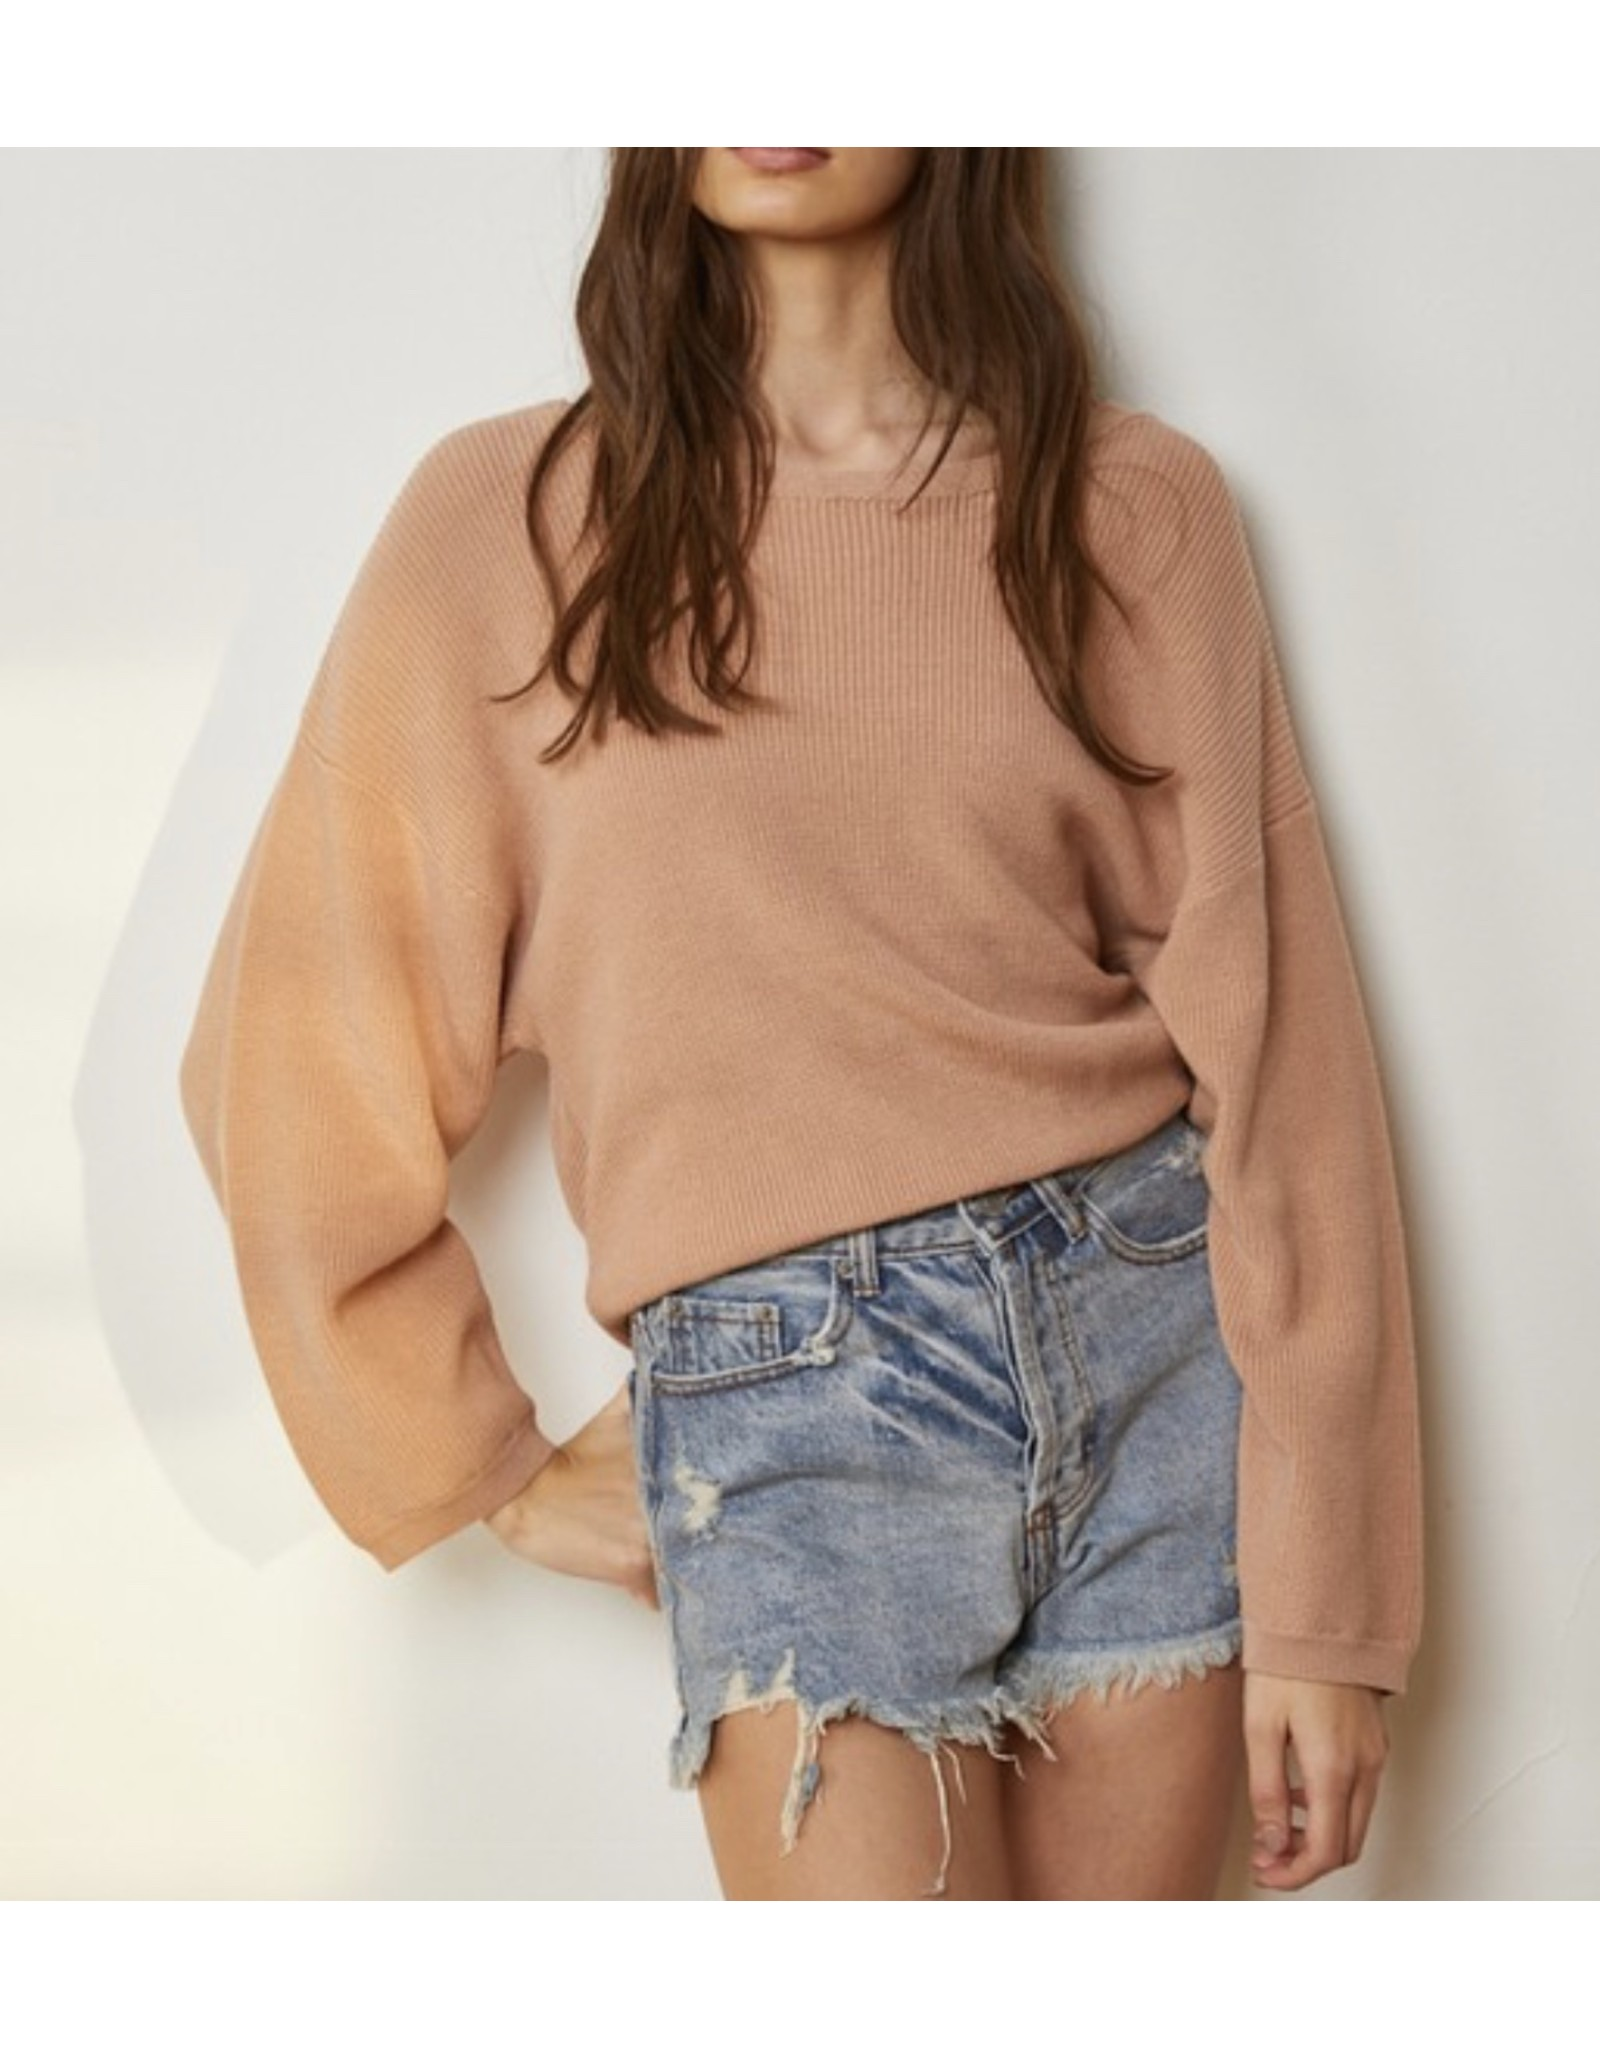 Twisted Open Back Sweater - Dusty Rose